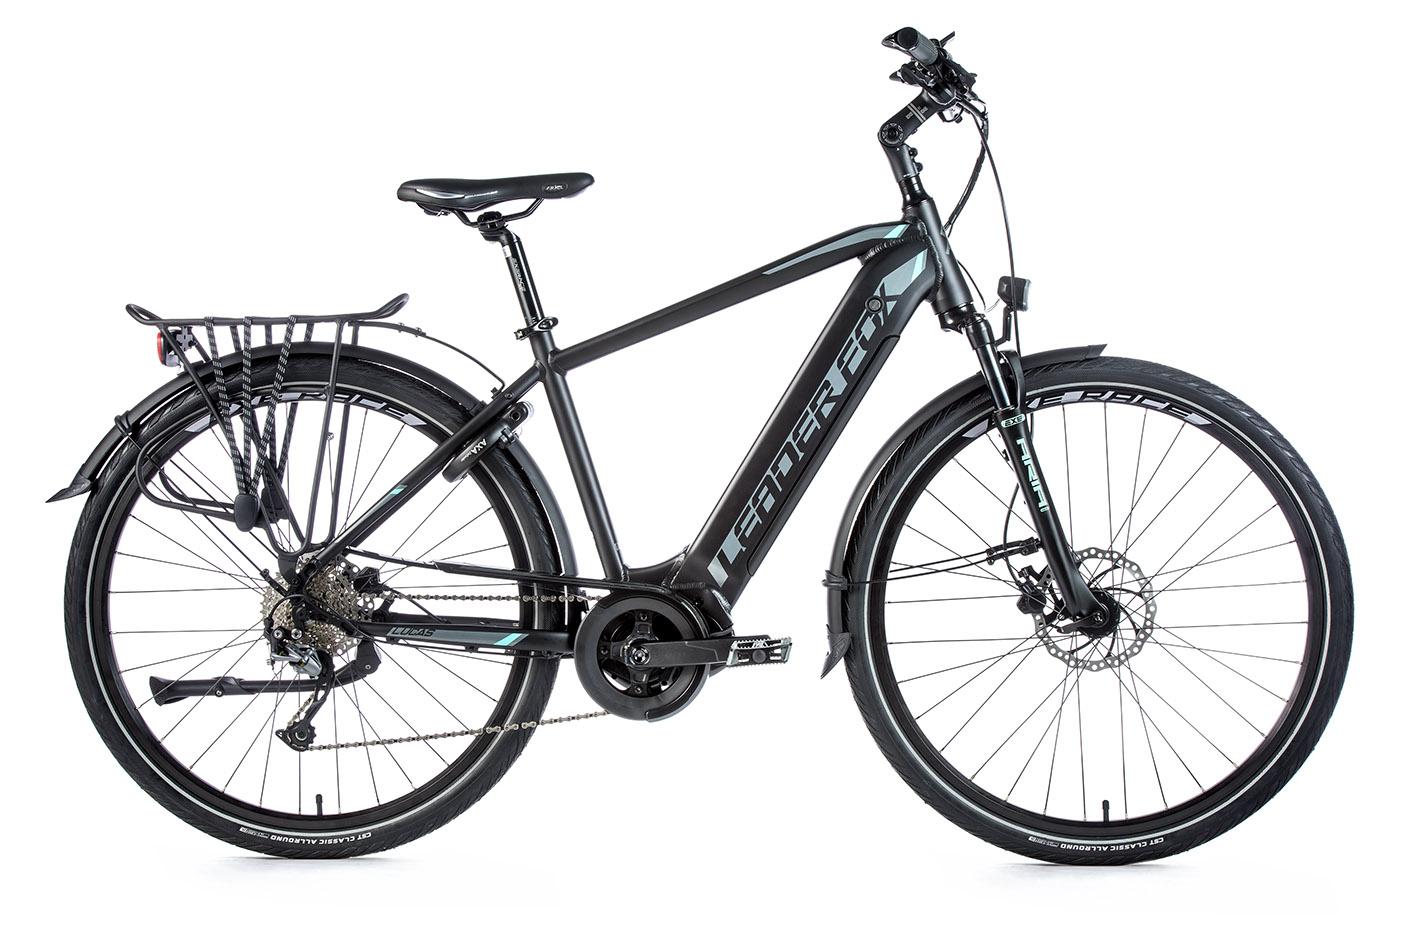 Bicicleta electrica Trekking Leader Fox Lucas Gent, 2020